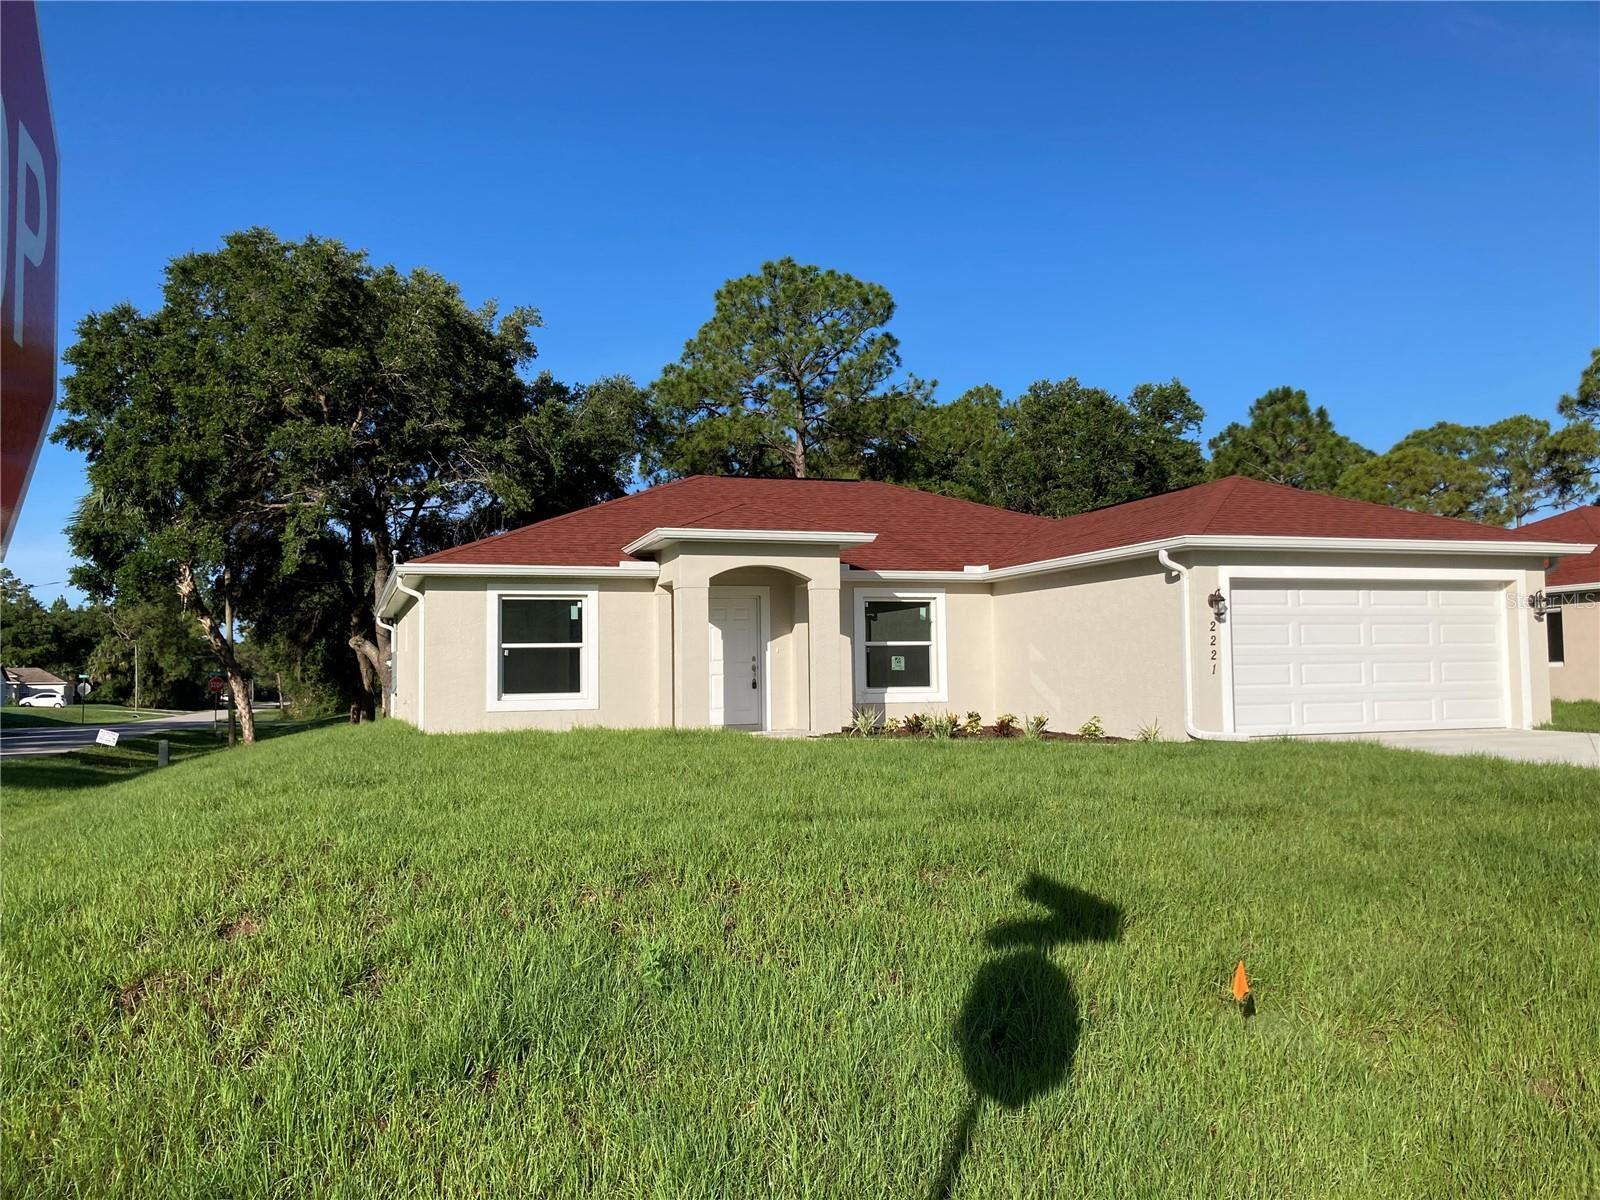 2221 SHEILA LANE, North Port, FL 34286 - MLS#: C7444900